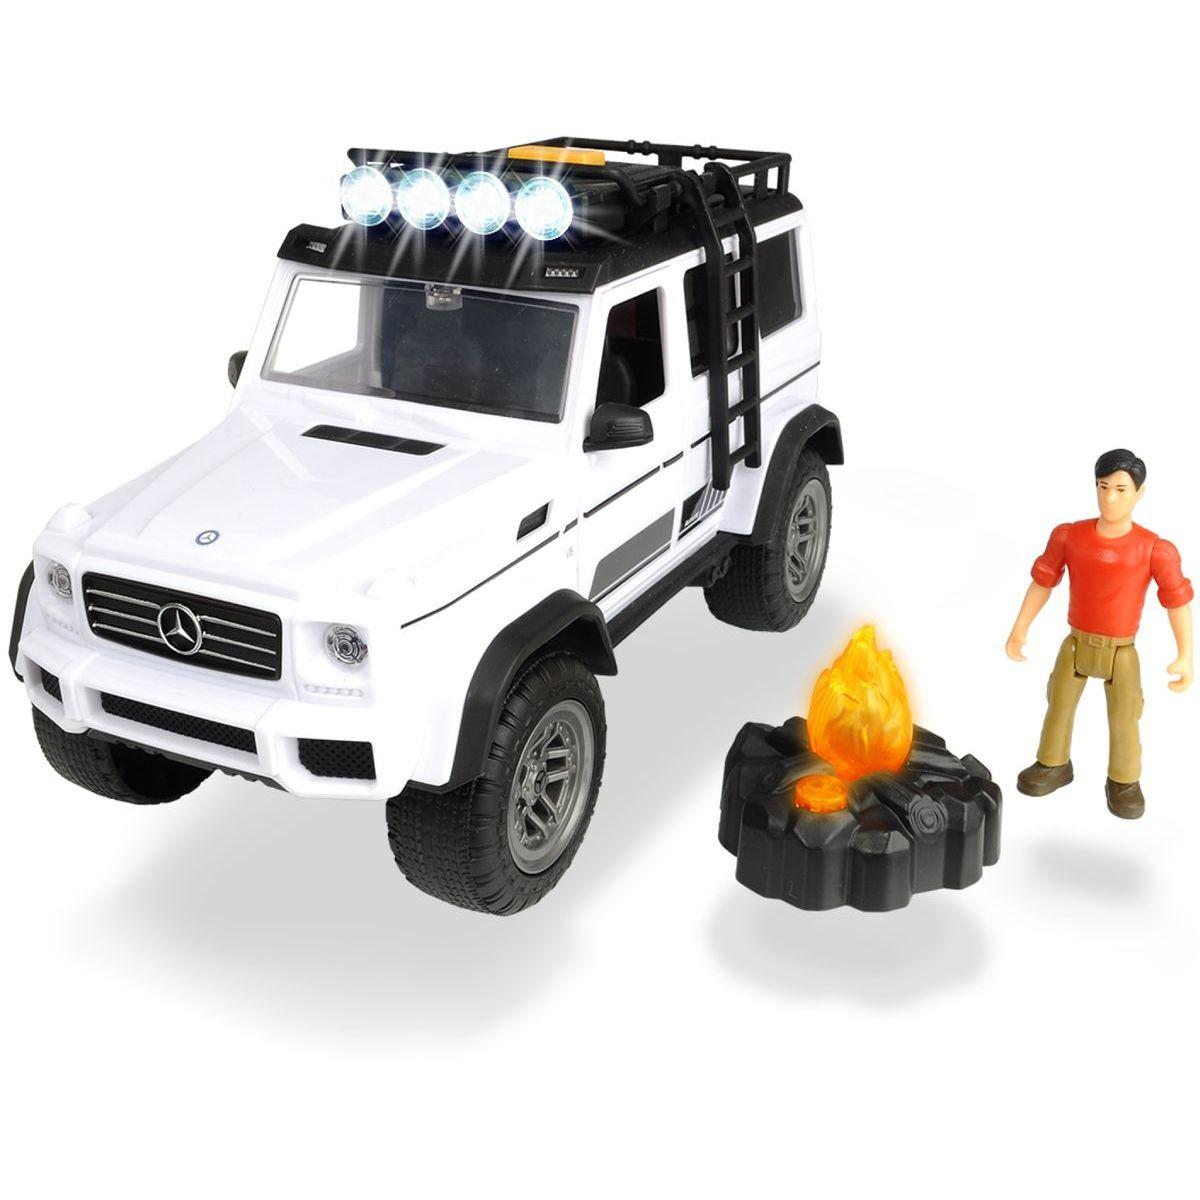 Dickie Mercedes V8 Adventure set